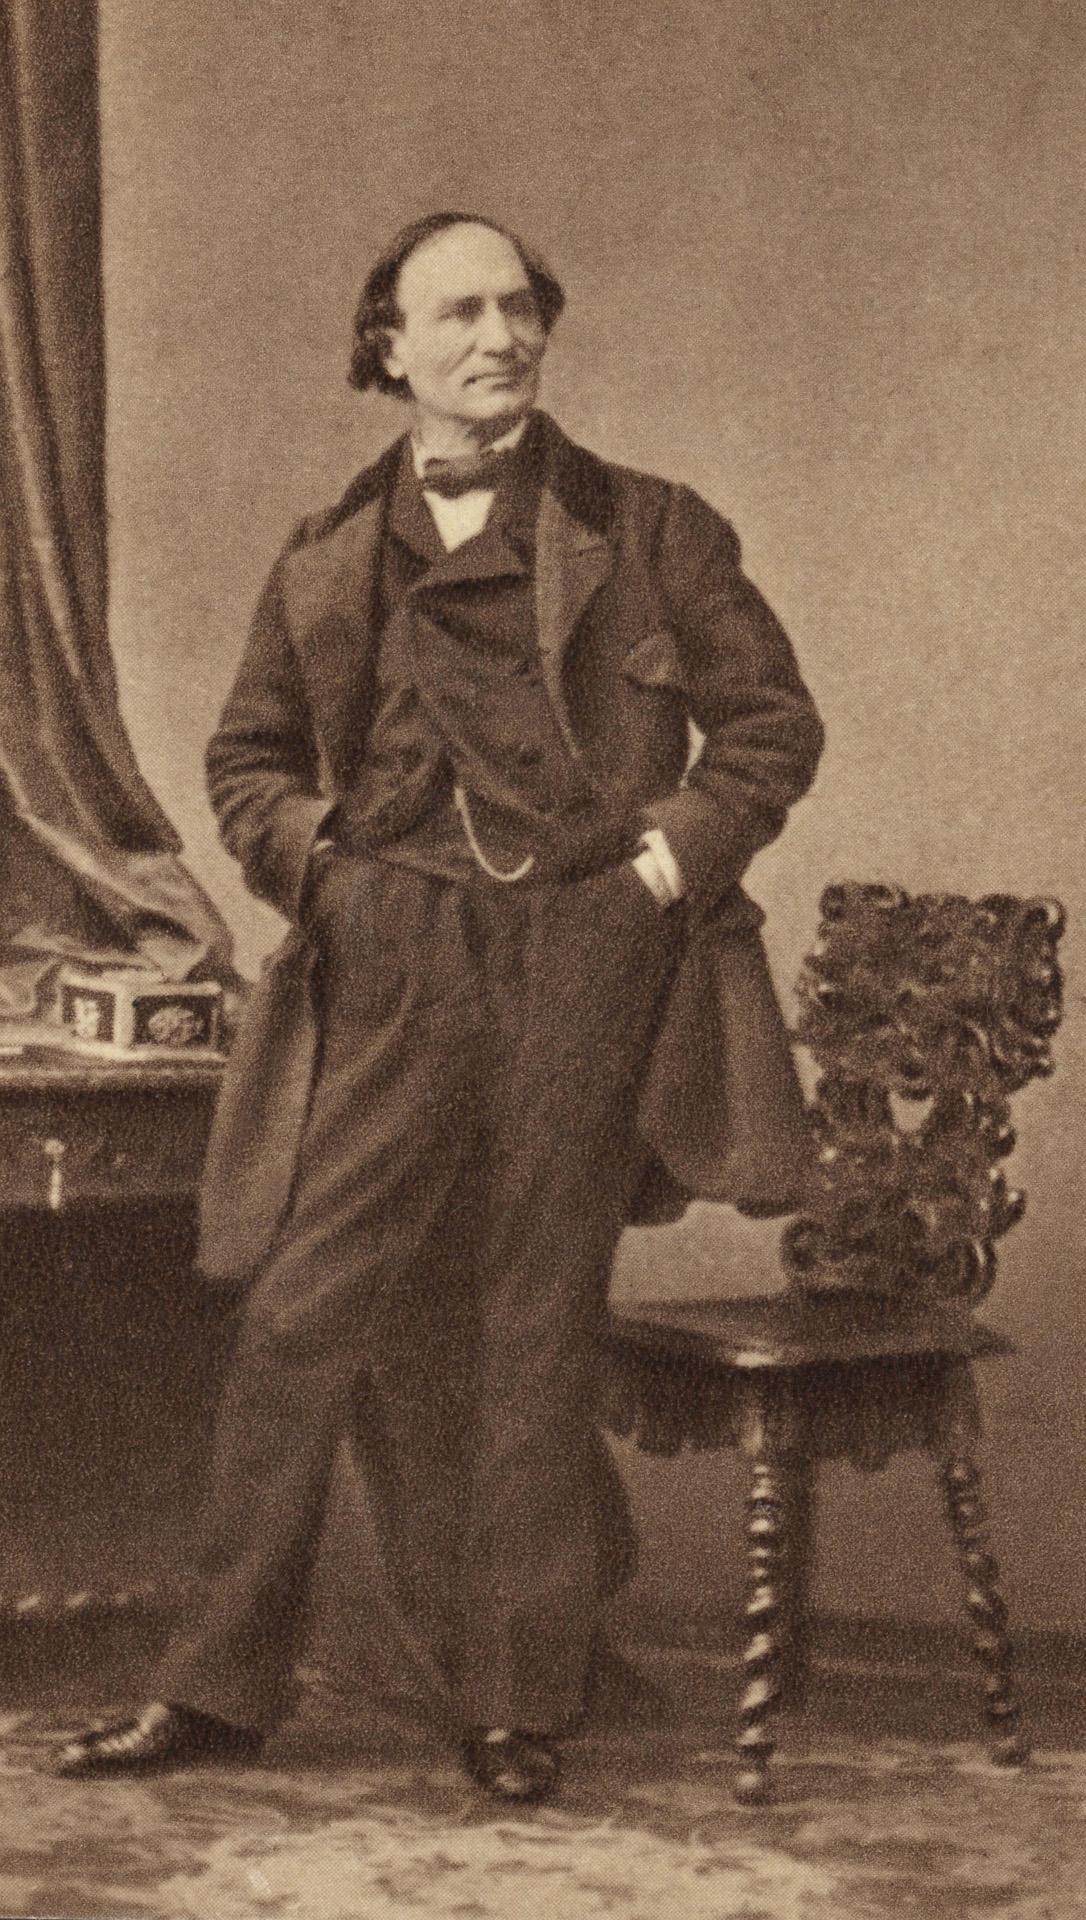 Robert-Houdin Jean EugËne known as Houdini1805-1871Photographed in 1855MagicianParis, Fondation NapolÈon